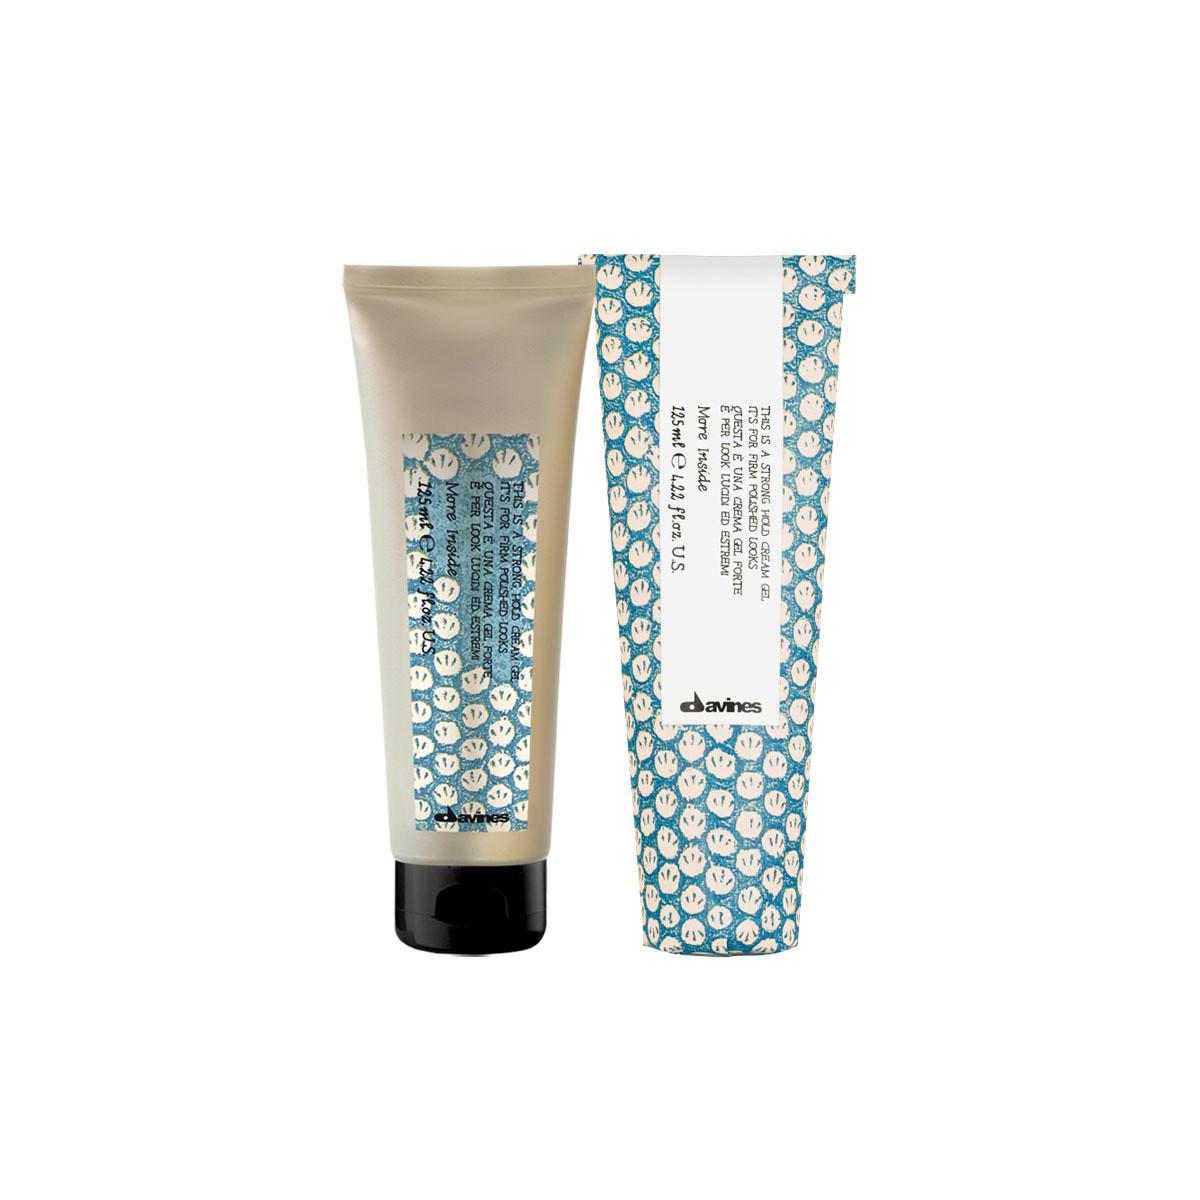 Davines This is a Strong Hold Cream Gel 125 ml | Crema-Gel Fijación Fuerte